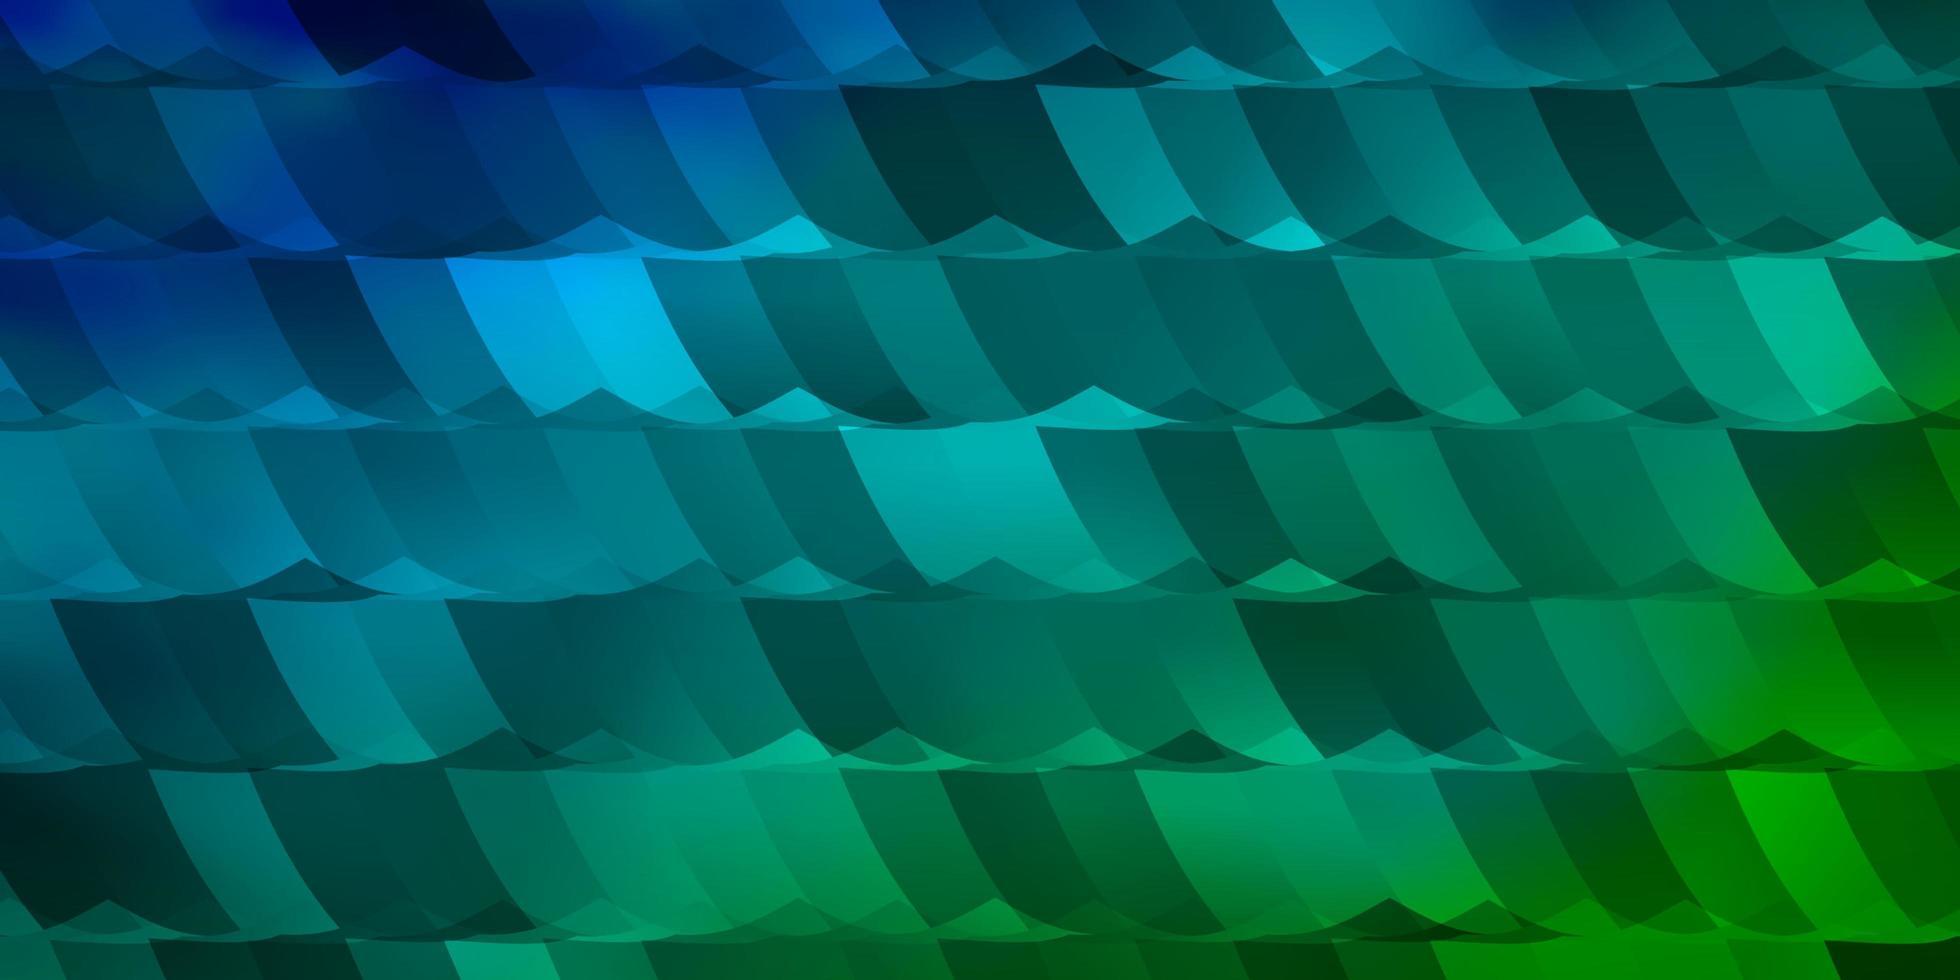 fundo vector azul, verde claro com hexágonos.